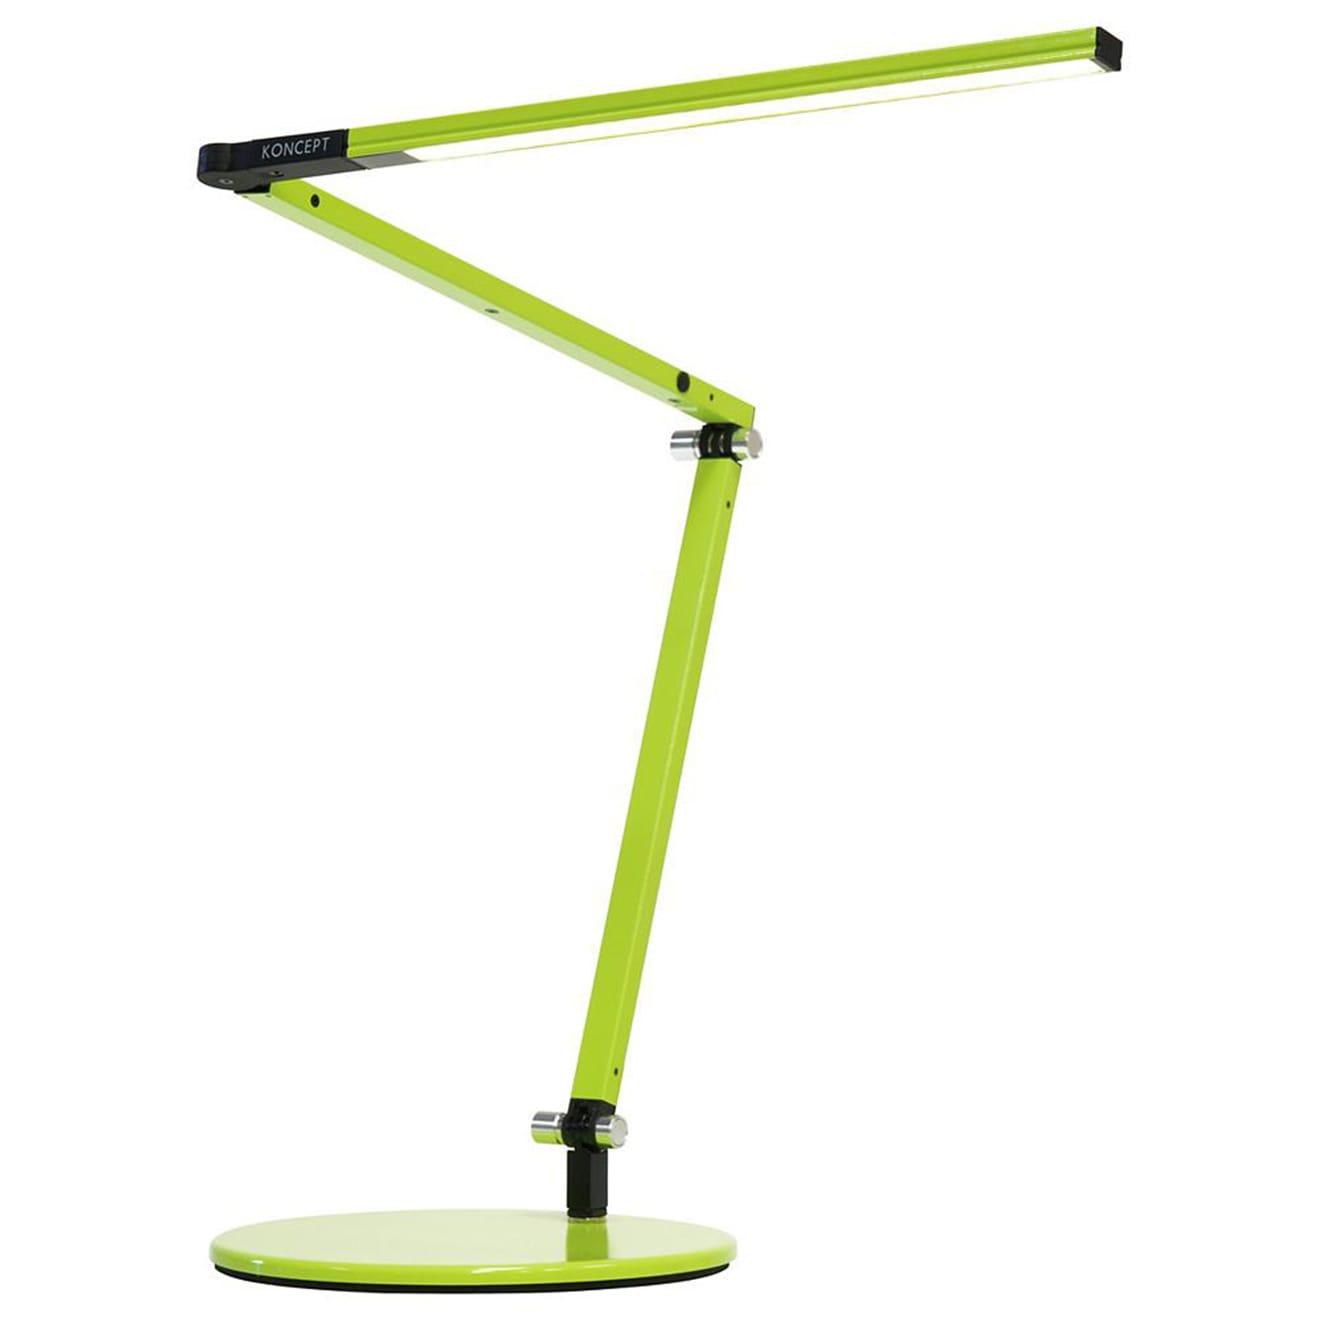 Z-Bar Mini Color LED Desk Lamp by Koncept